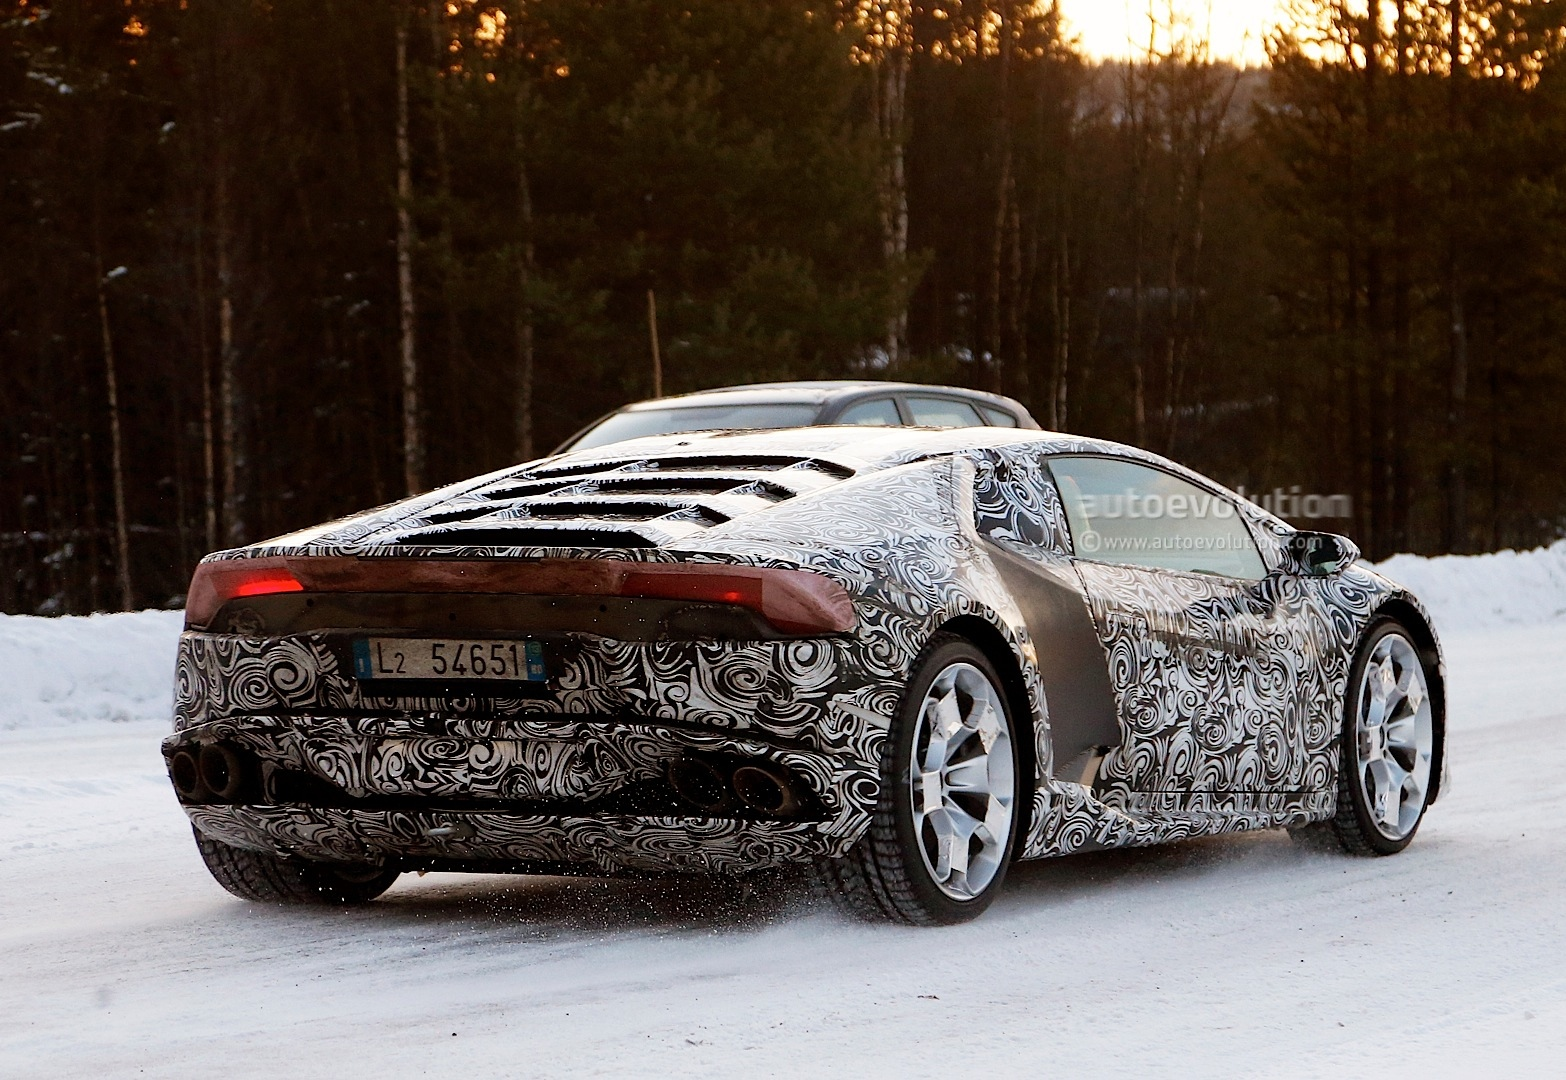 2013 - [Lamborghini] Huracán LP610-4  - Page 4 Lamborghini-huracan-gallardo-successor-begins-winter-testing-photo-gallery-1080p-8